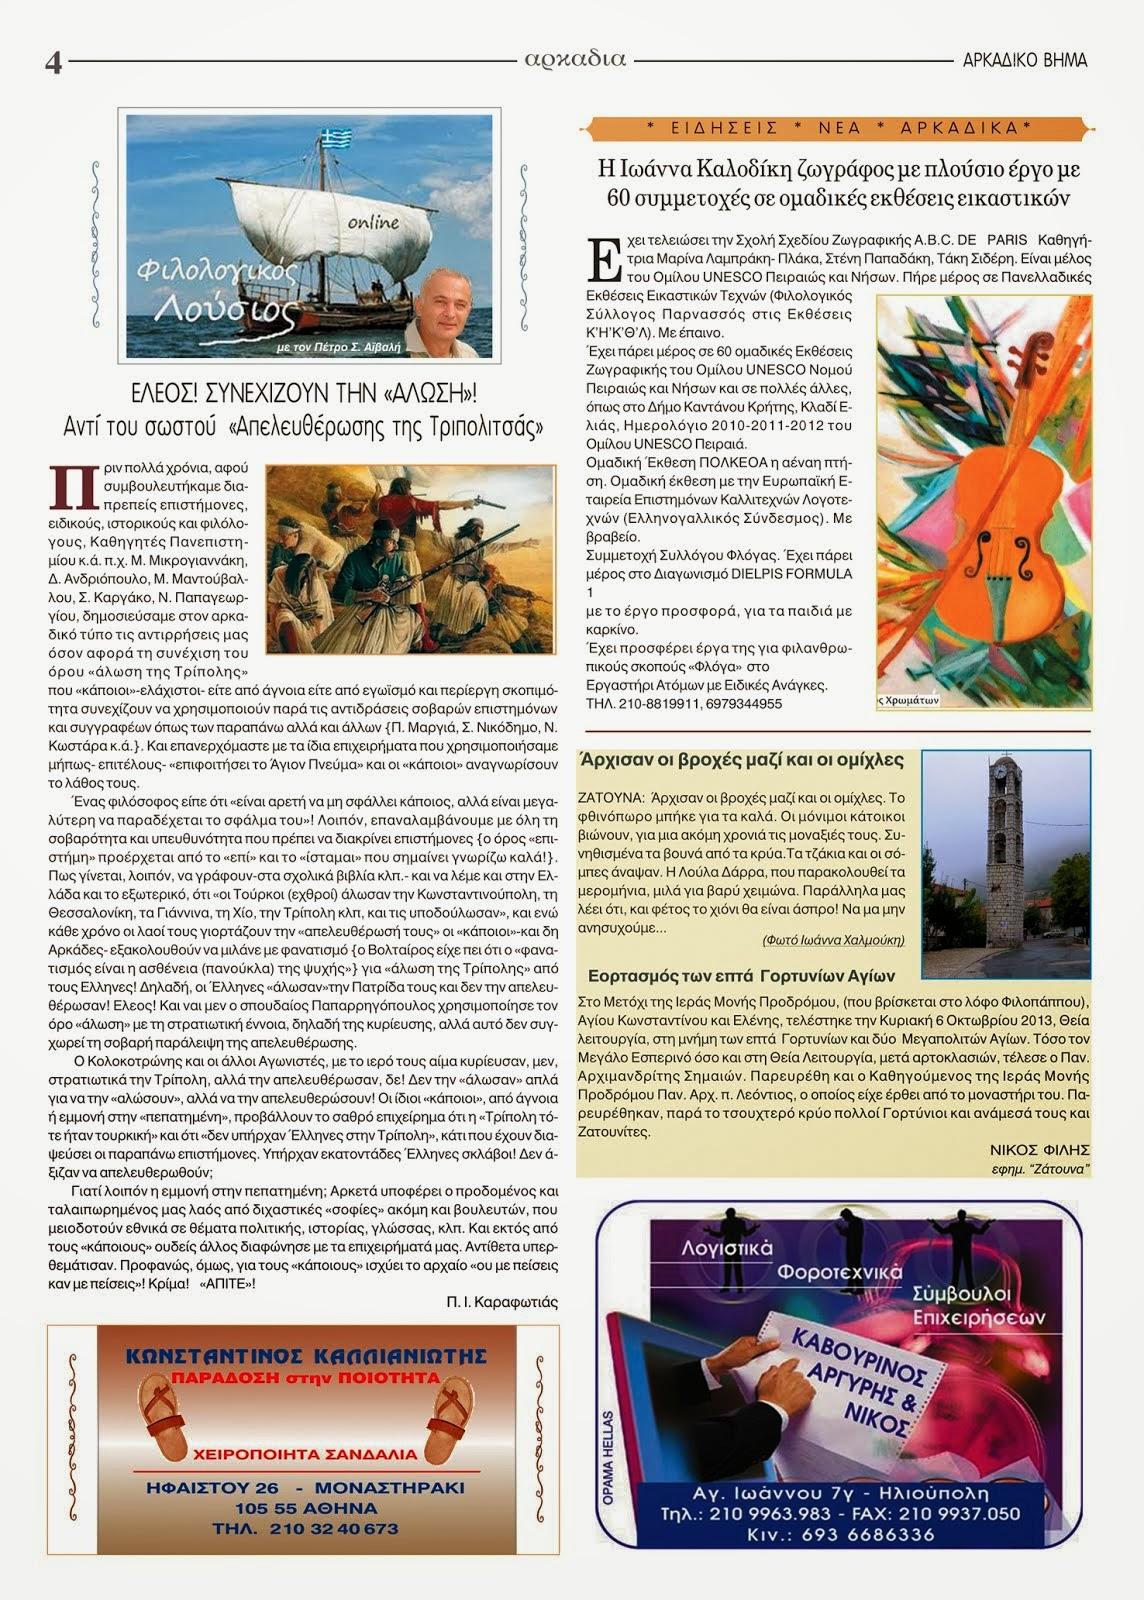 Eπιμέλεια σελίδας: Πέτρος Αϊβαλής